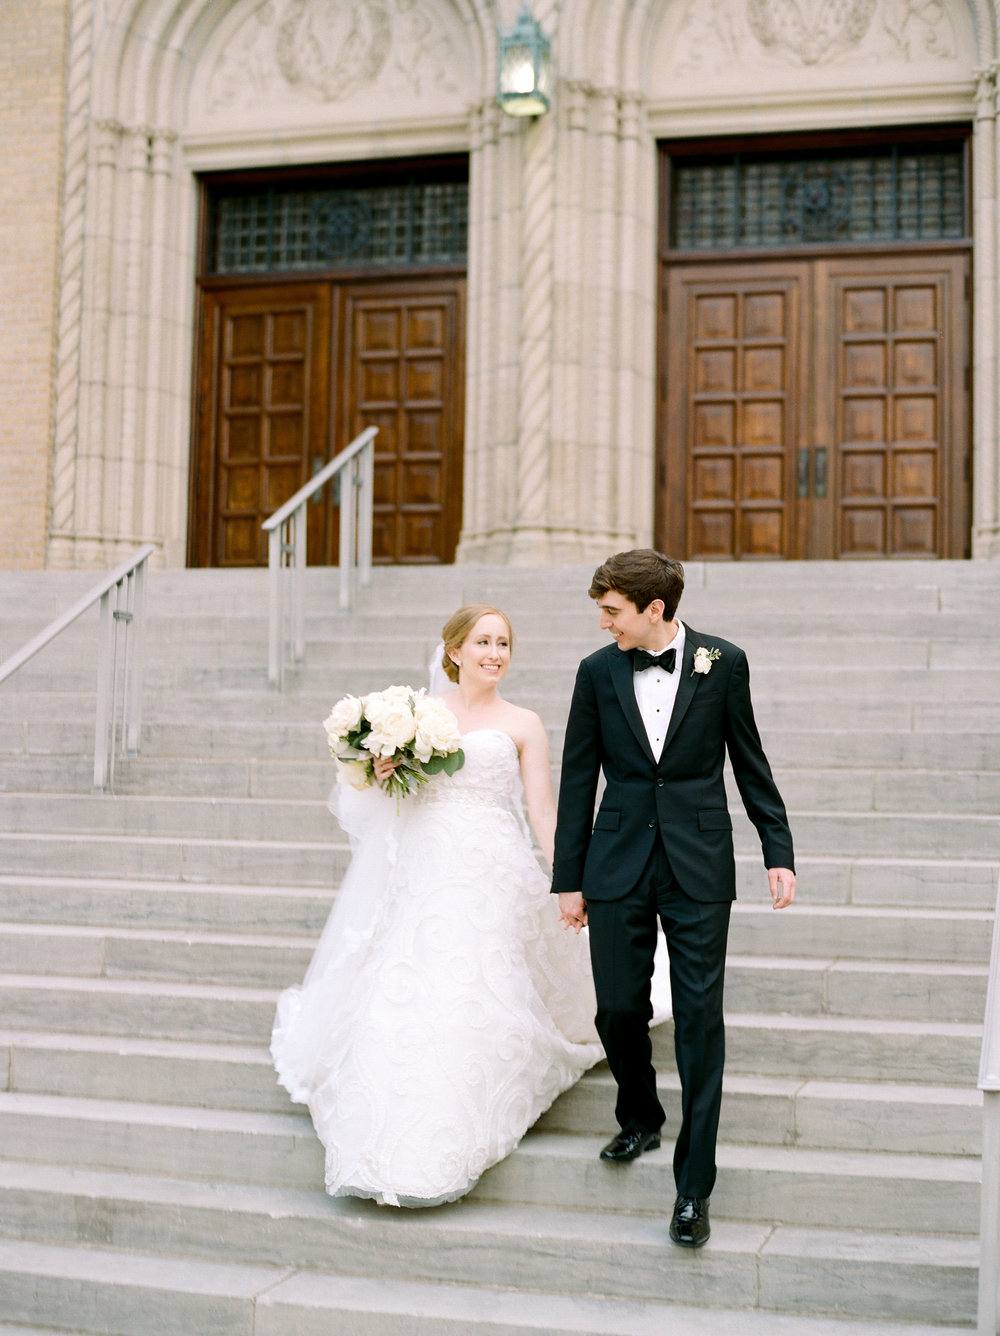 houston-wedding-planner-fine-art-luxury-designer-top-best-destination-austin-dallas-kelly-doonan-events-river-oaks-country-club-133